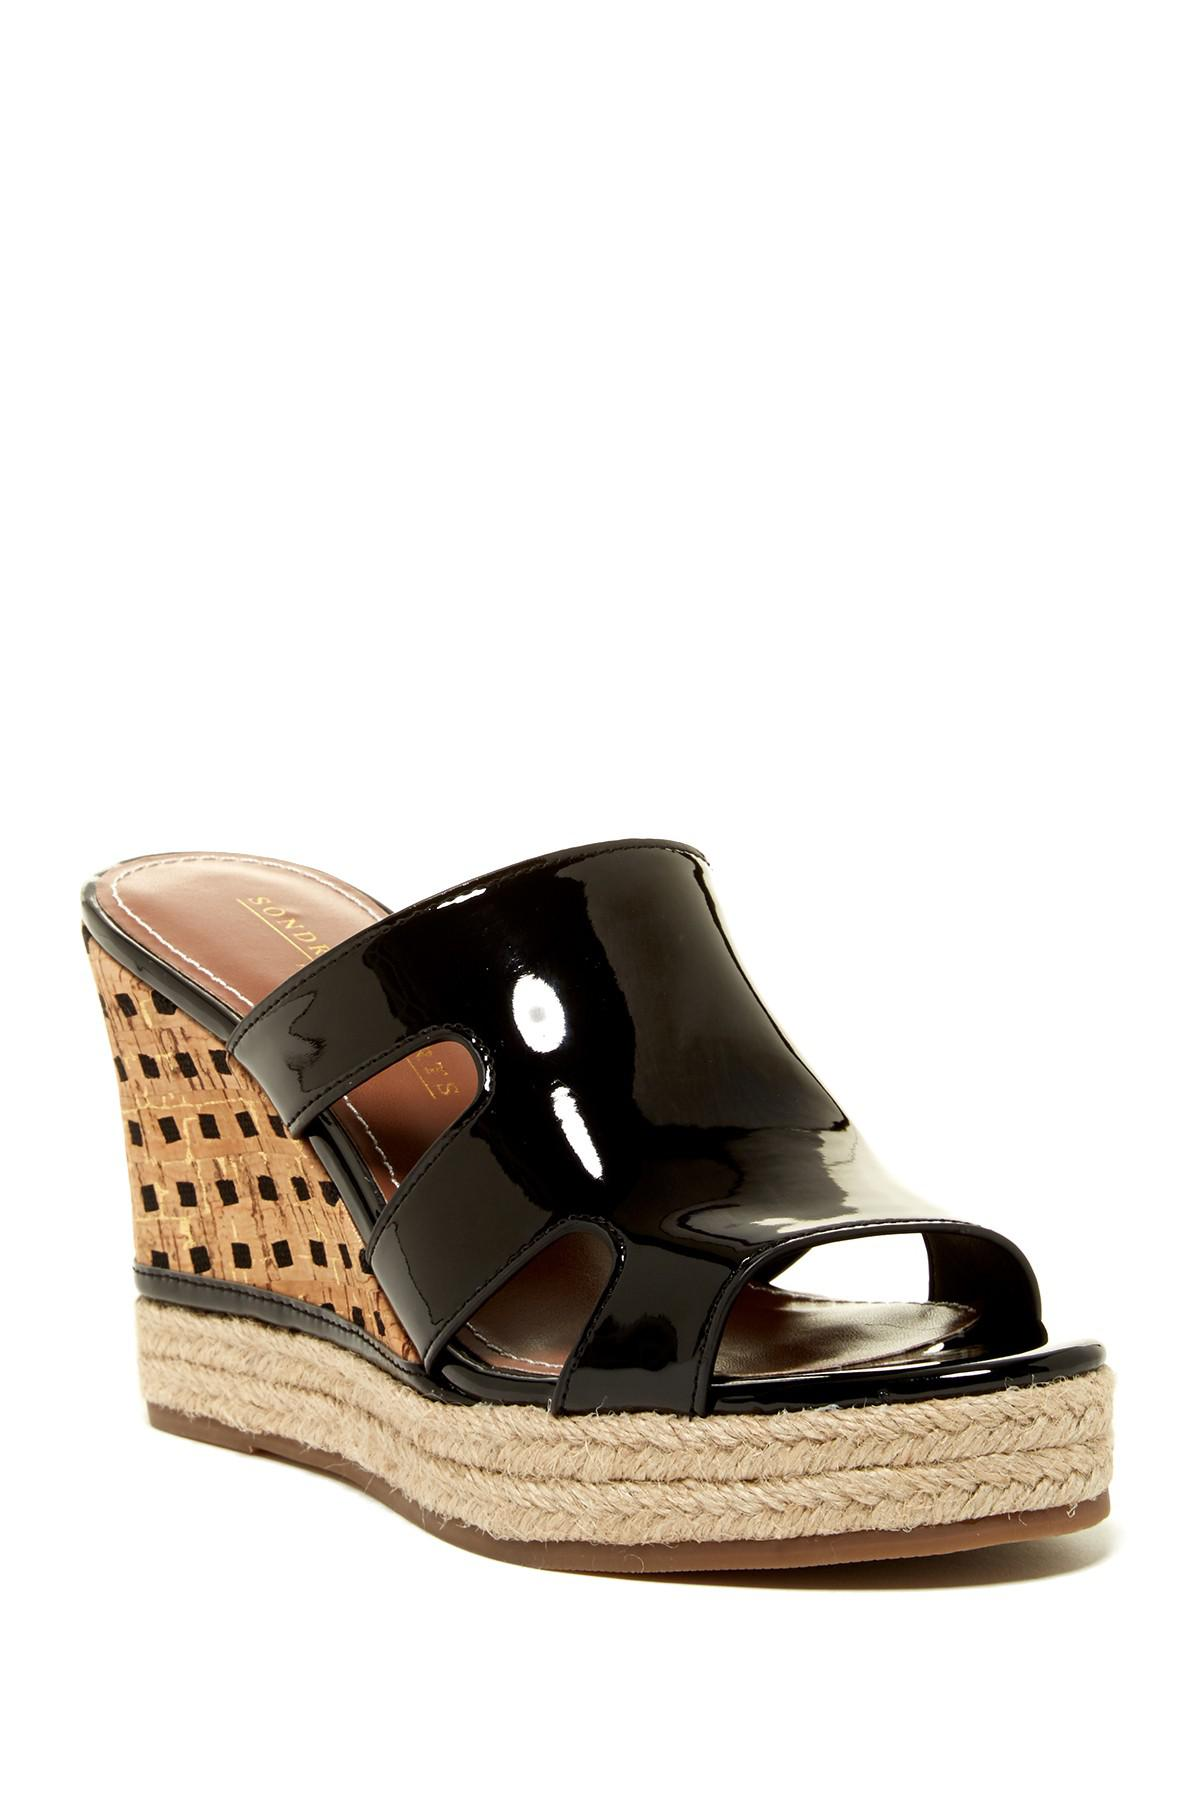 d1e605bb9 Lyst - Sondra Roberts Angie Wedge Sandal in Black